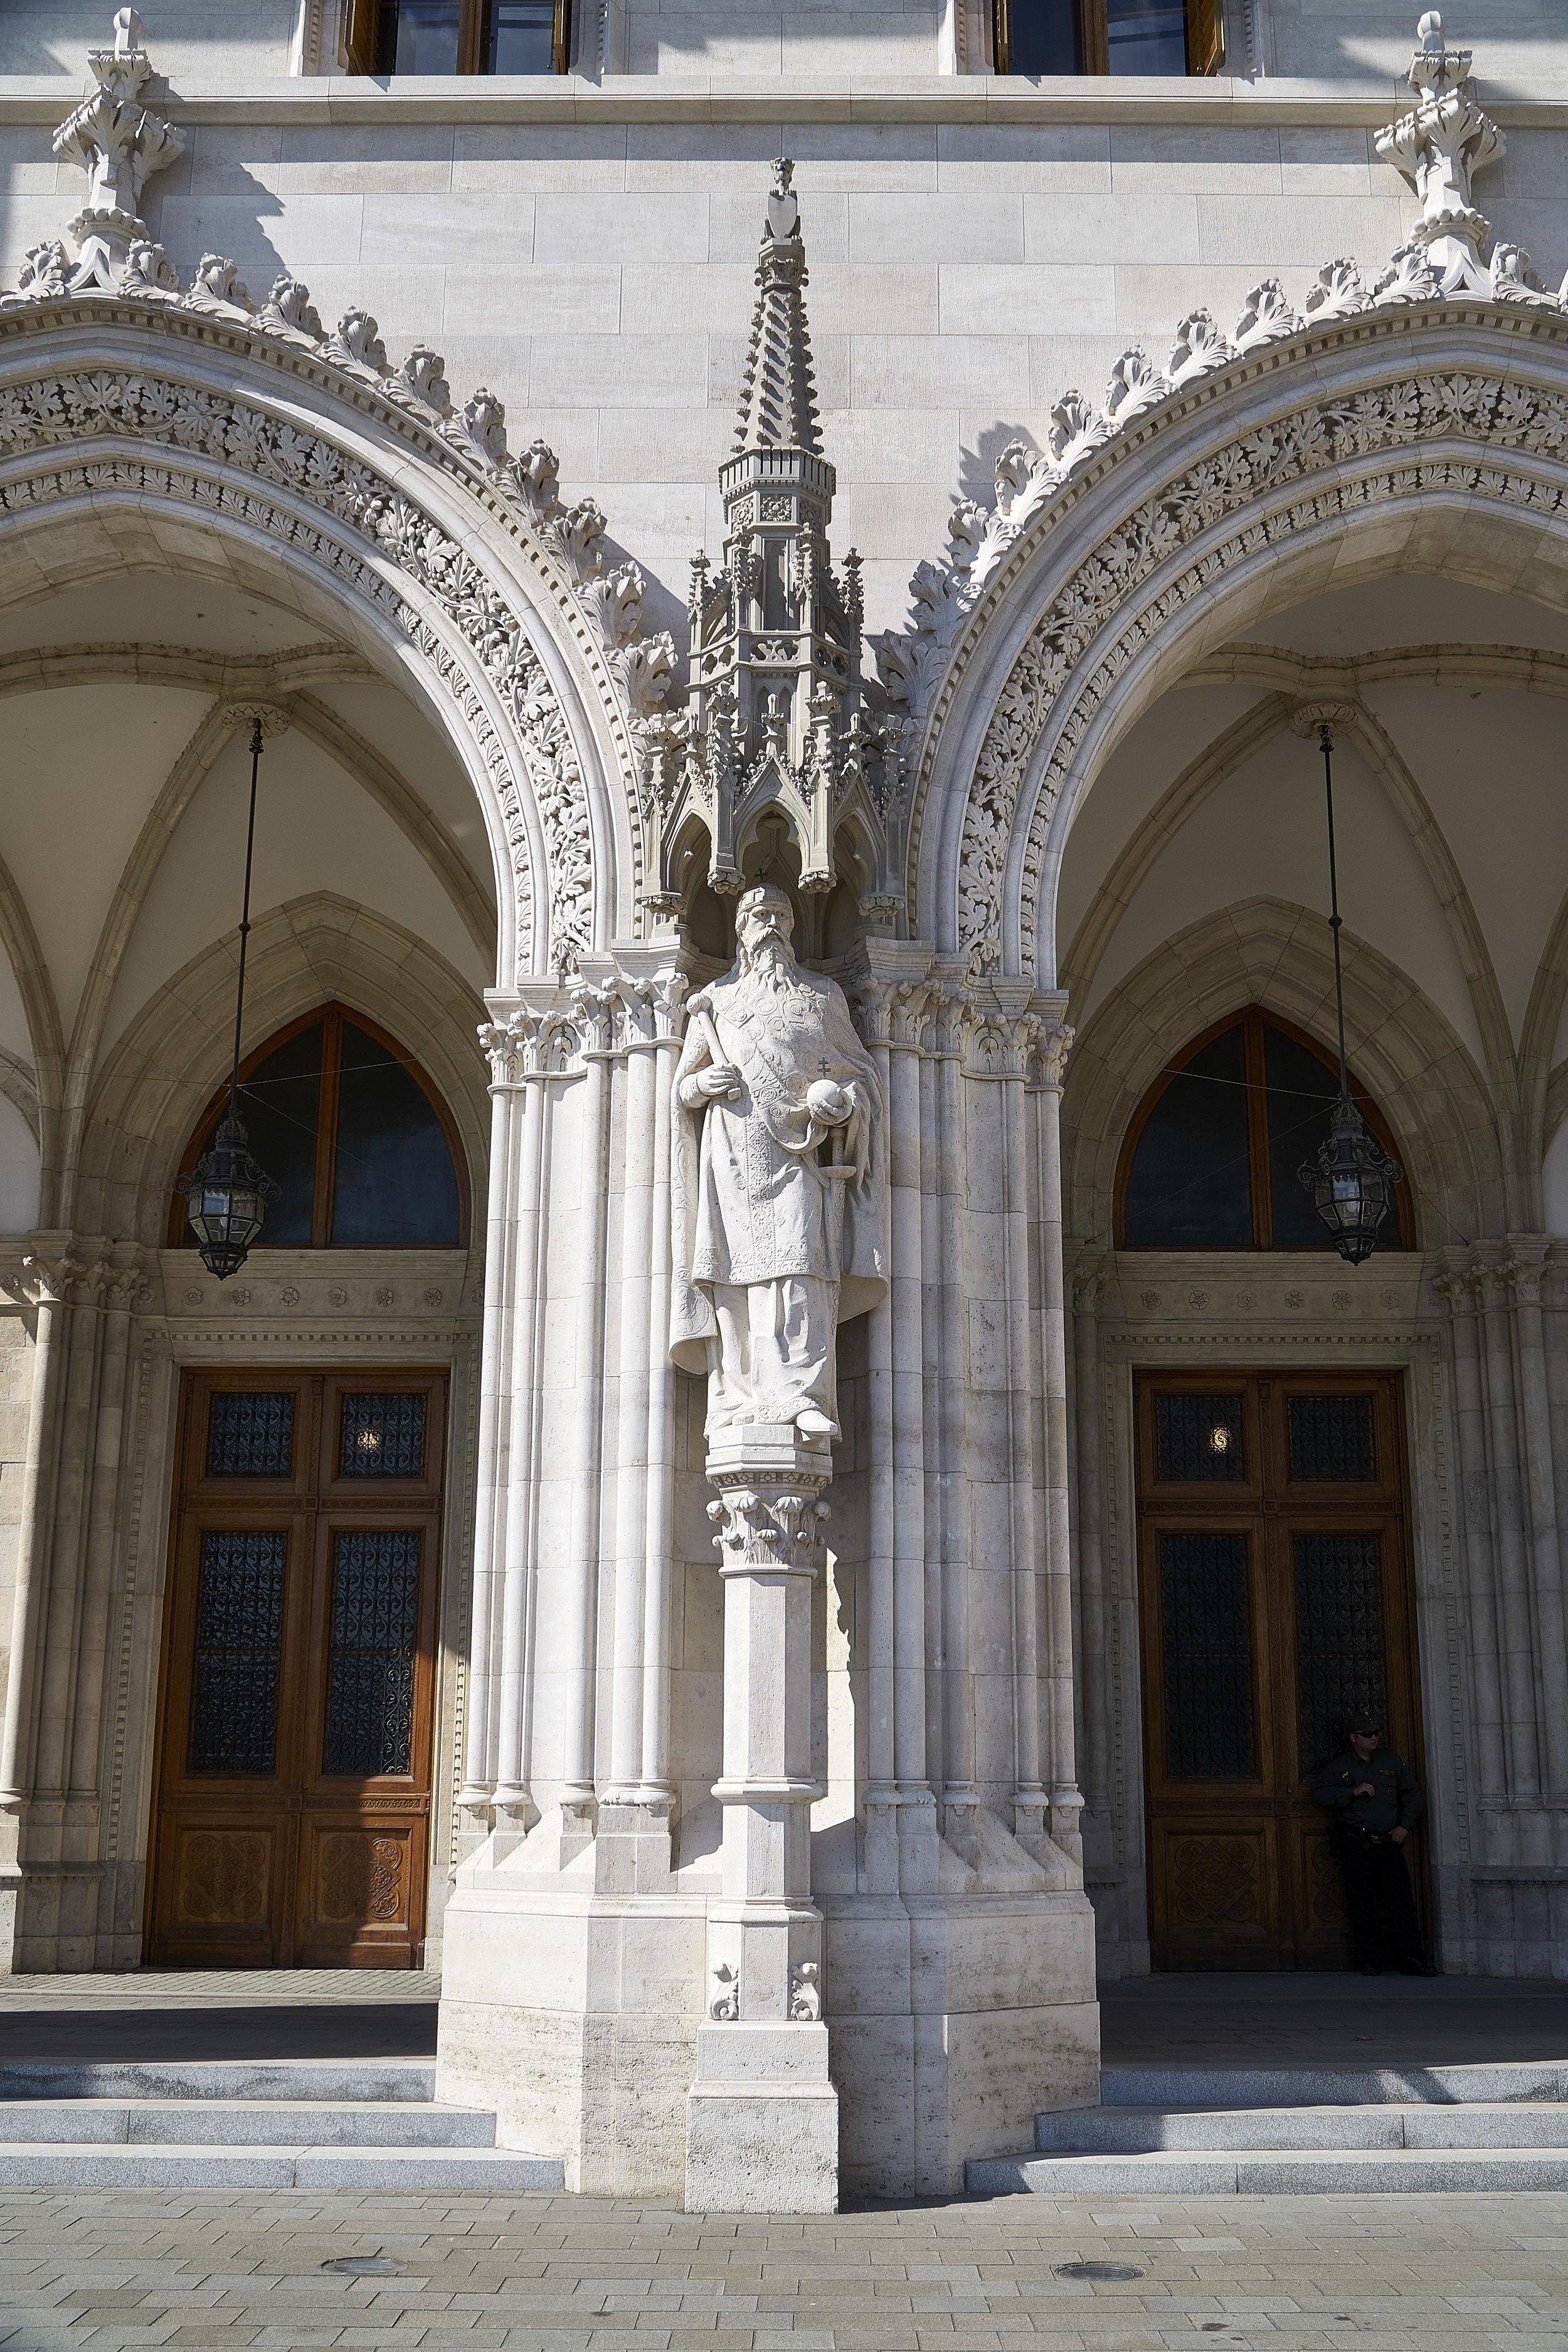 parliment building 2.jpg